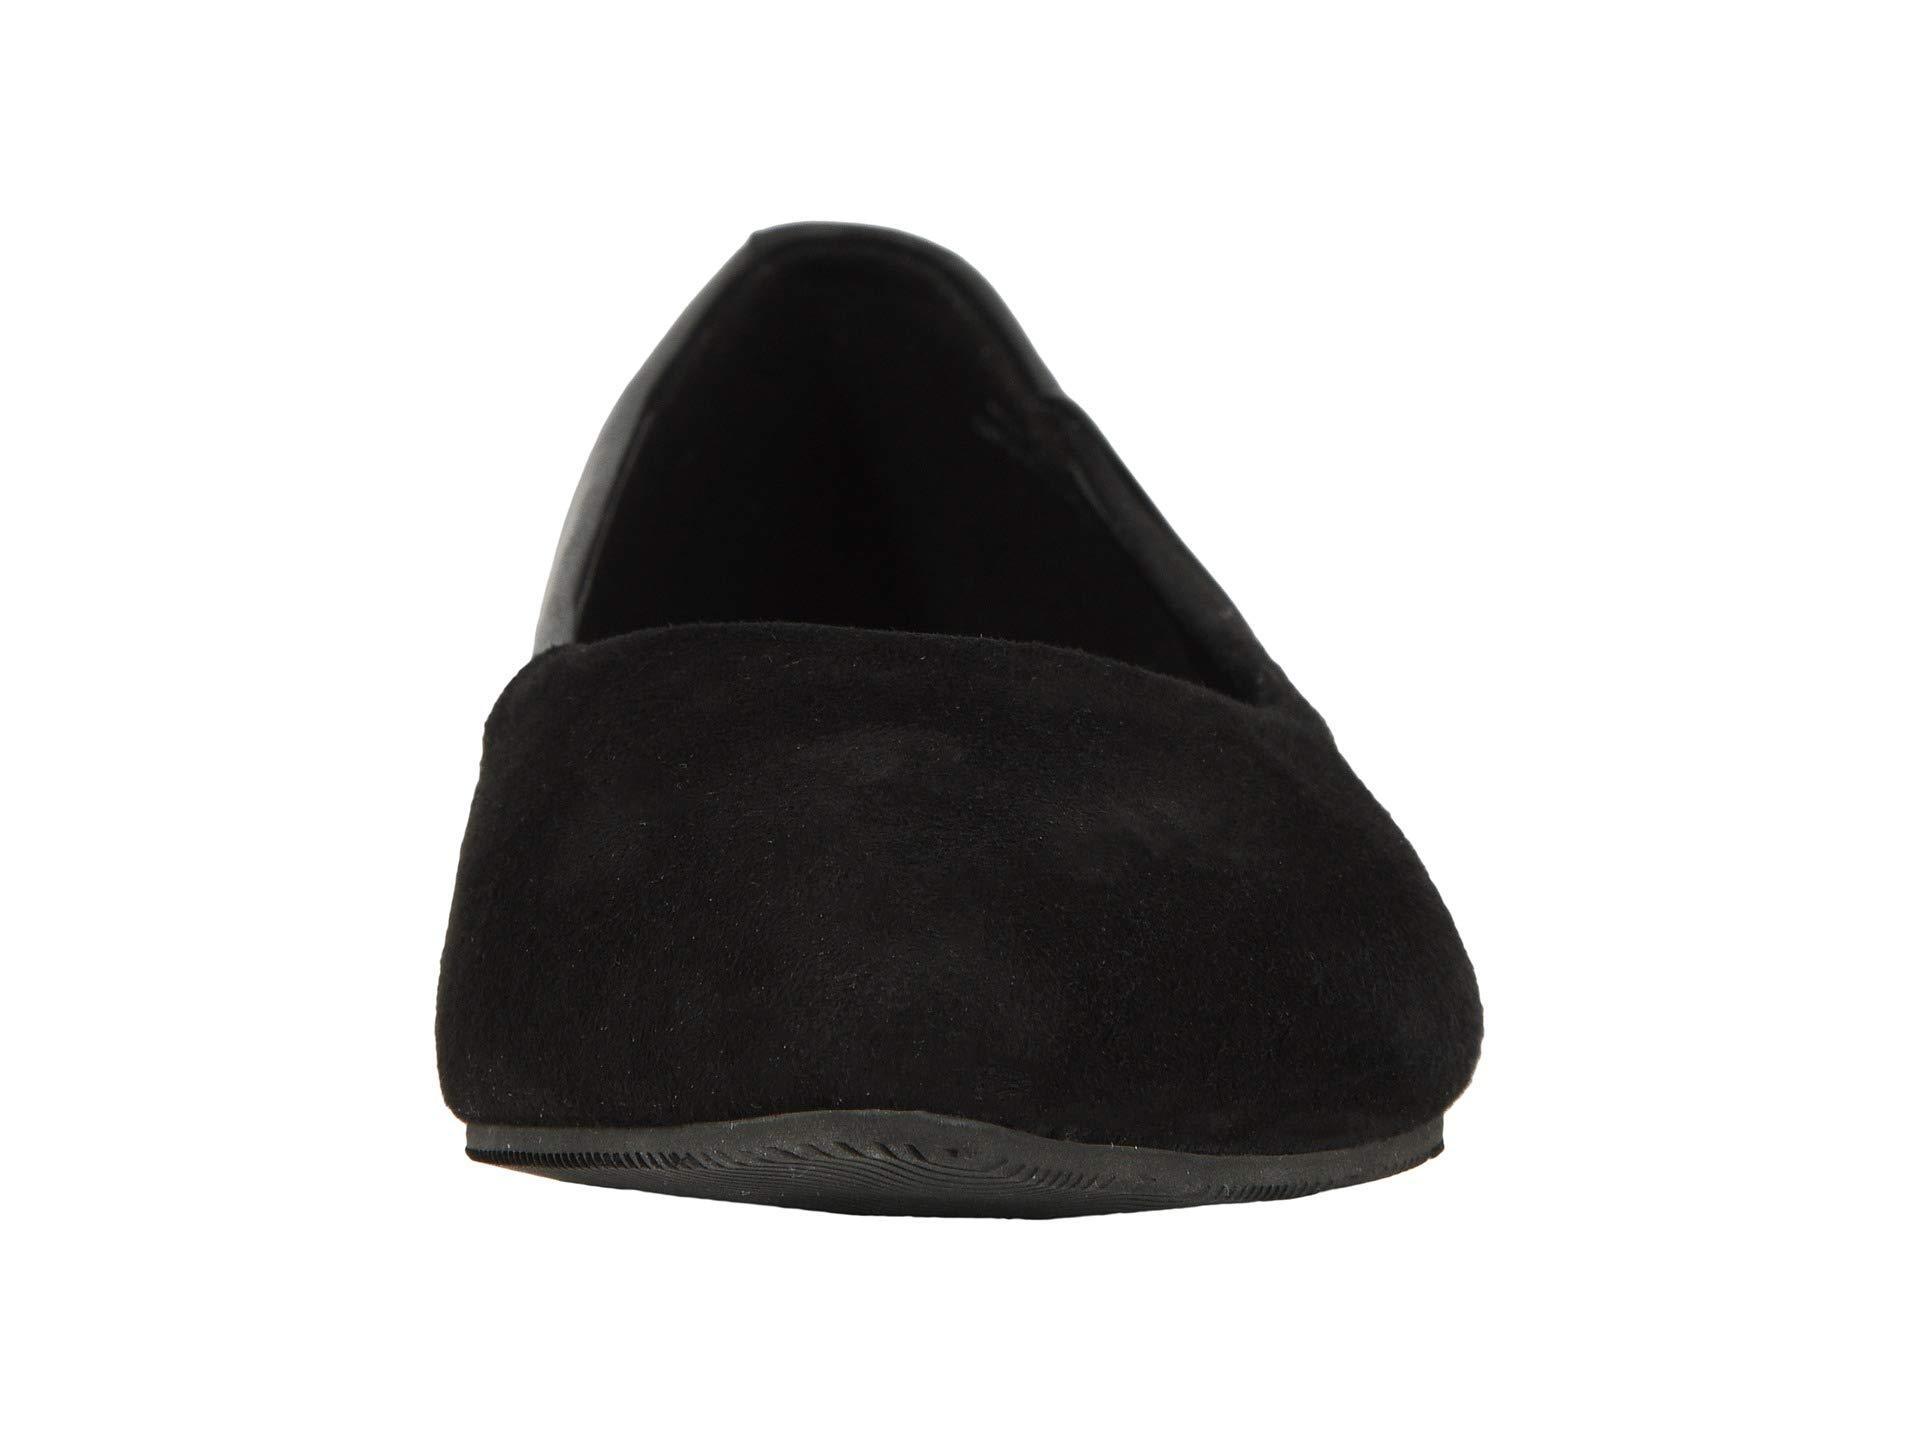 5c2ca487100 Softwalk® - Black Sava X Lea (sand) Women s Flat Shoes - Lyst. View  fullscreen